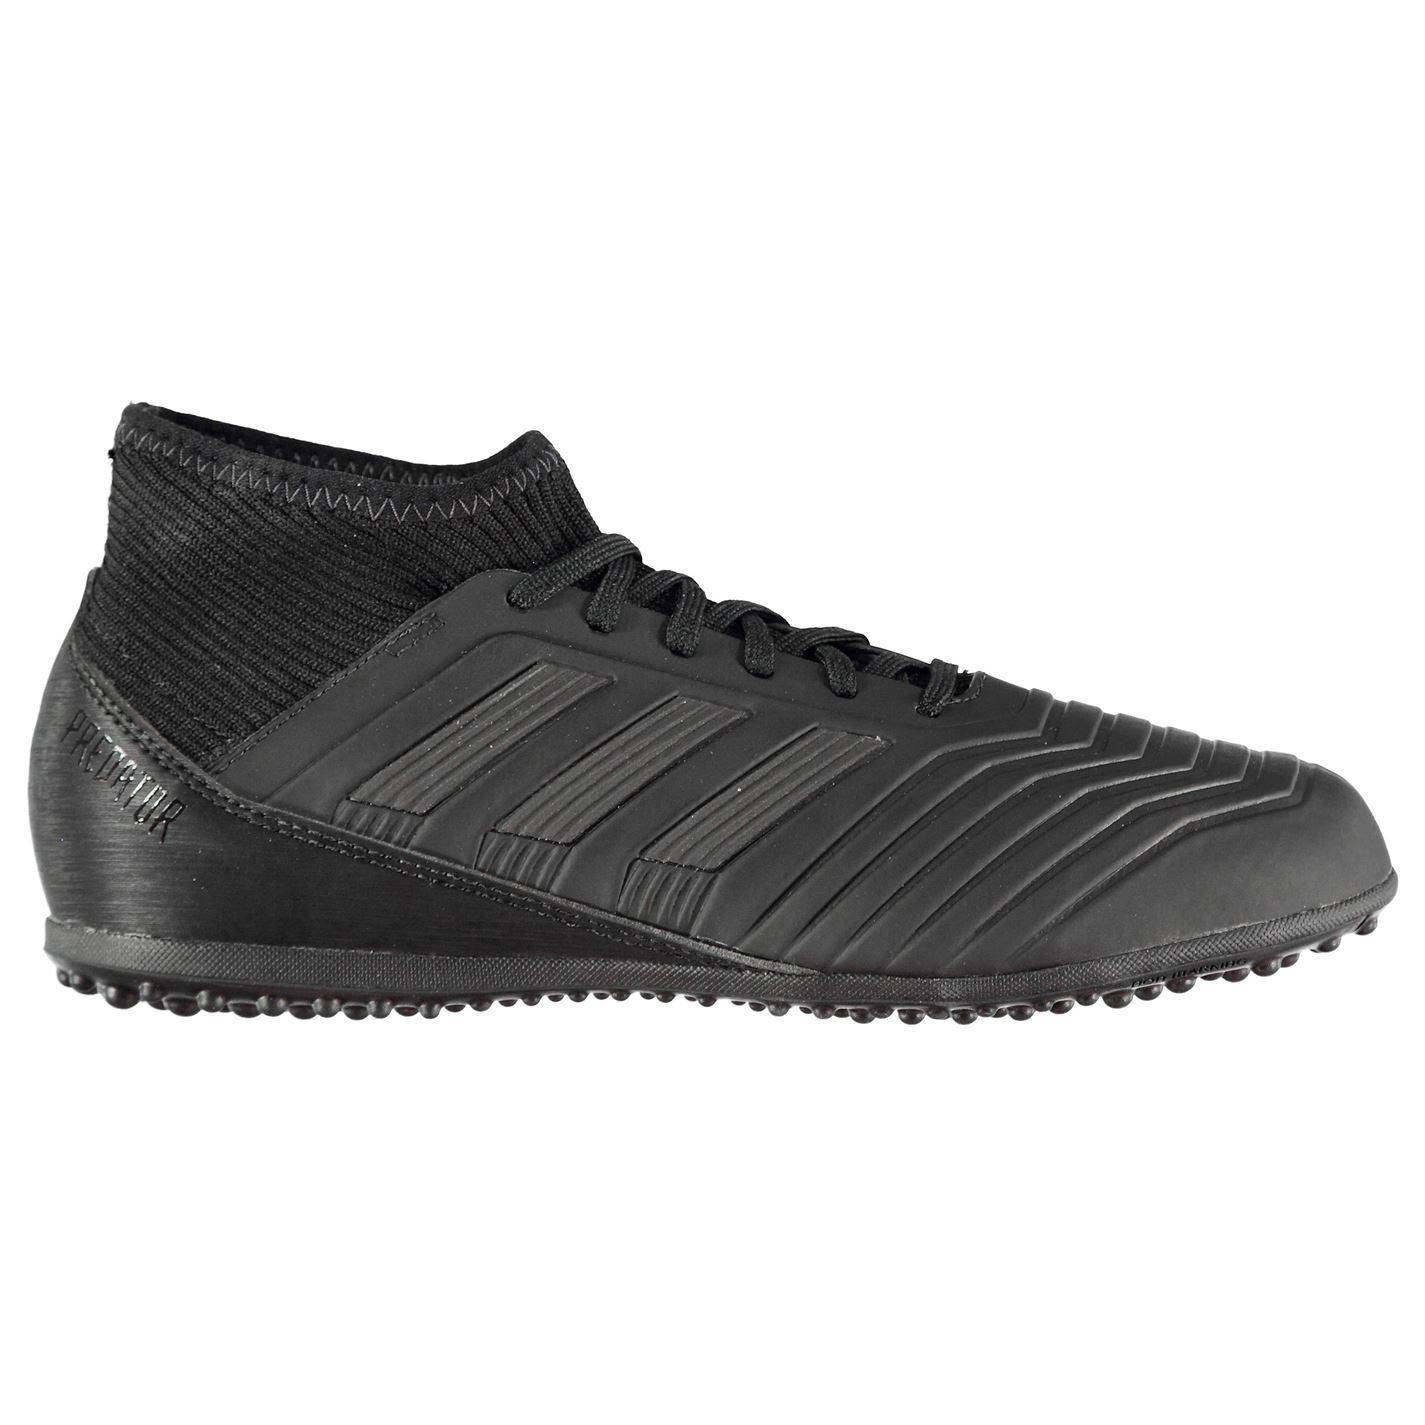 53d57ebea79c adidas Kids Predator Tango 18.3 Junior Astro Turf Trainers Football Boots  Lace